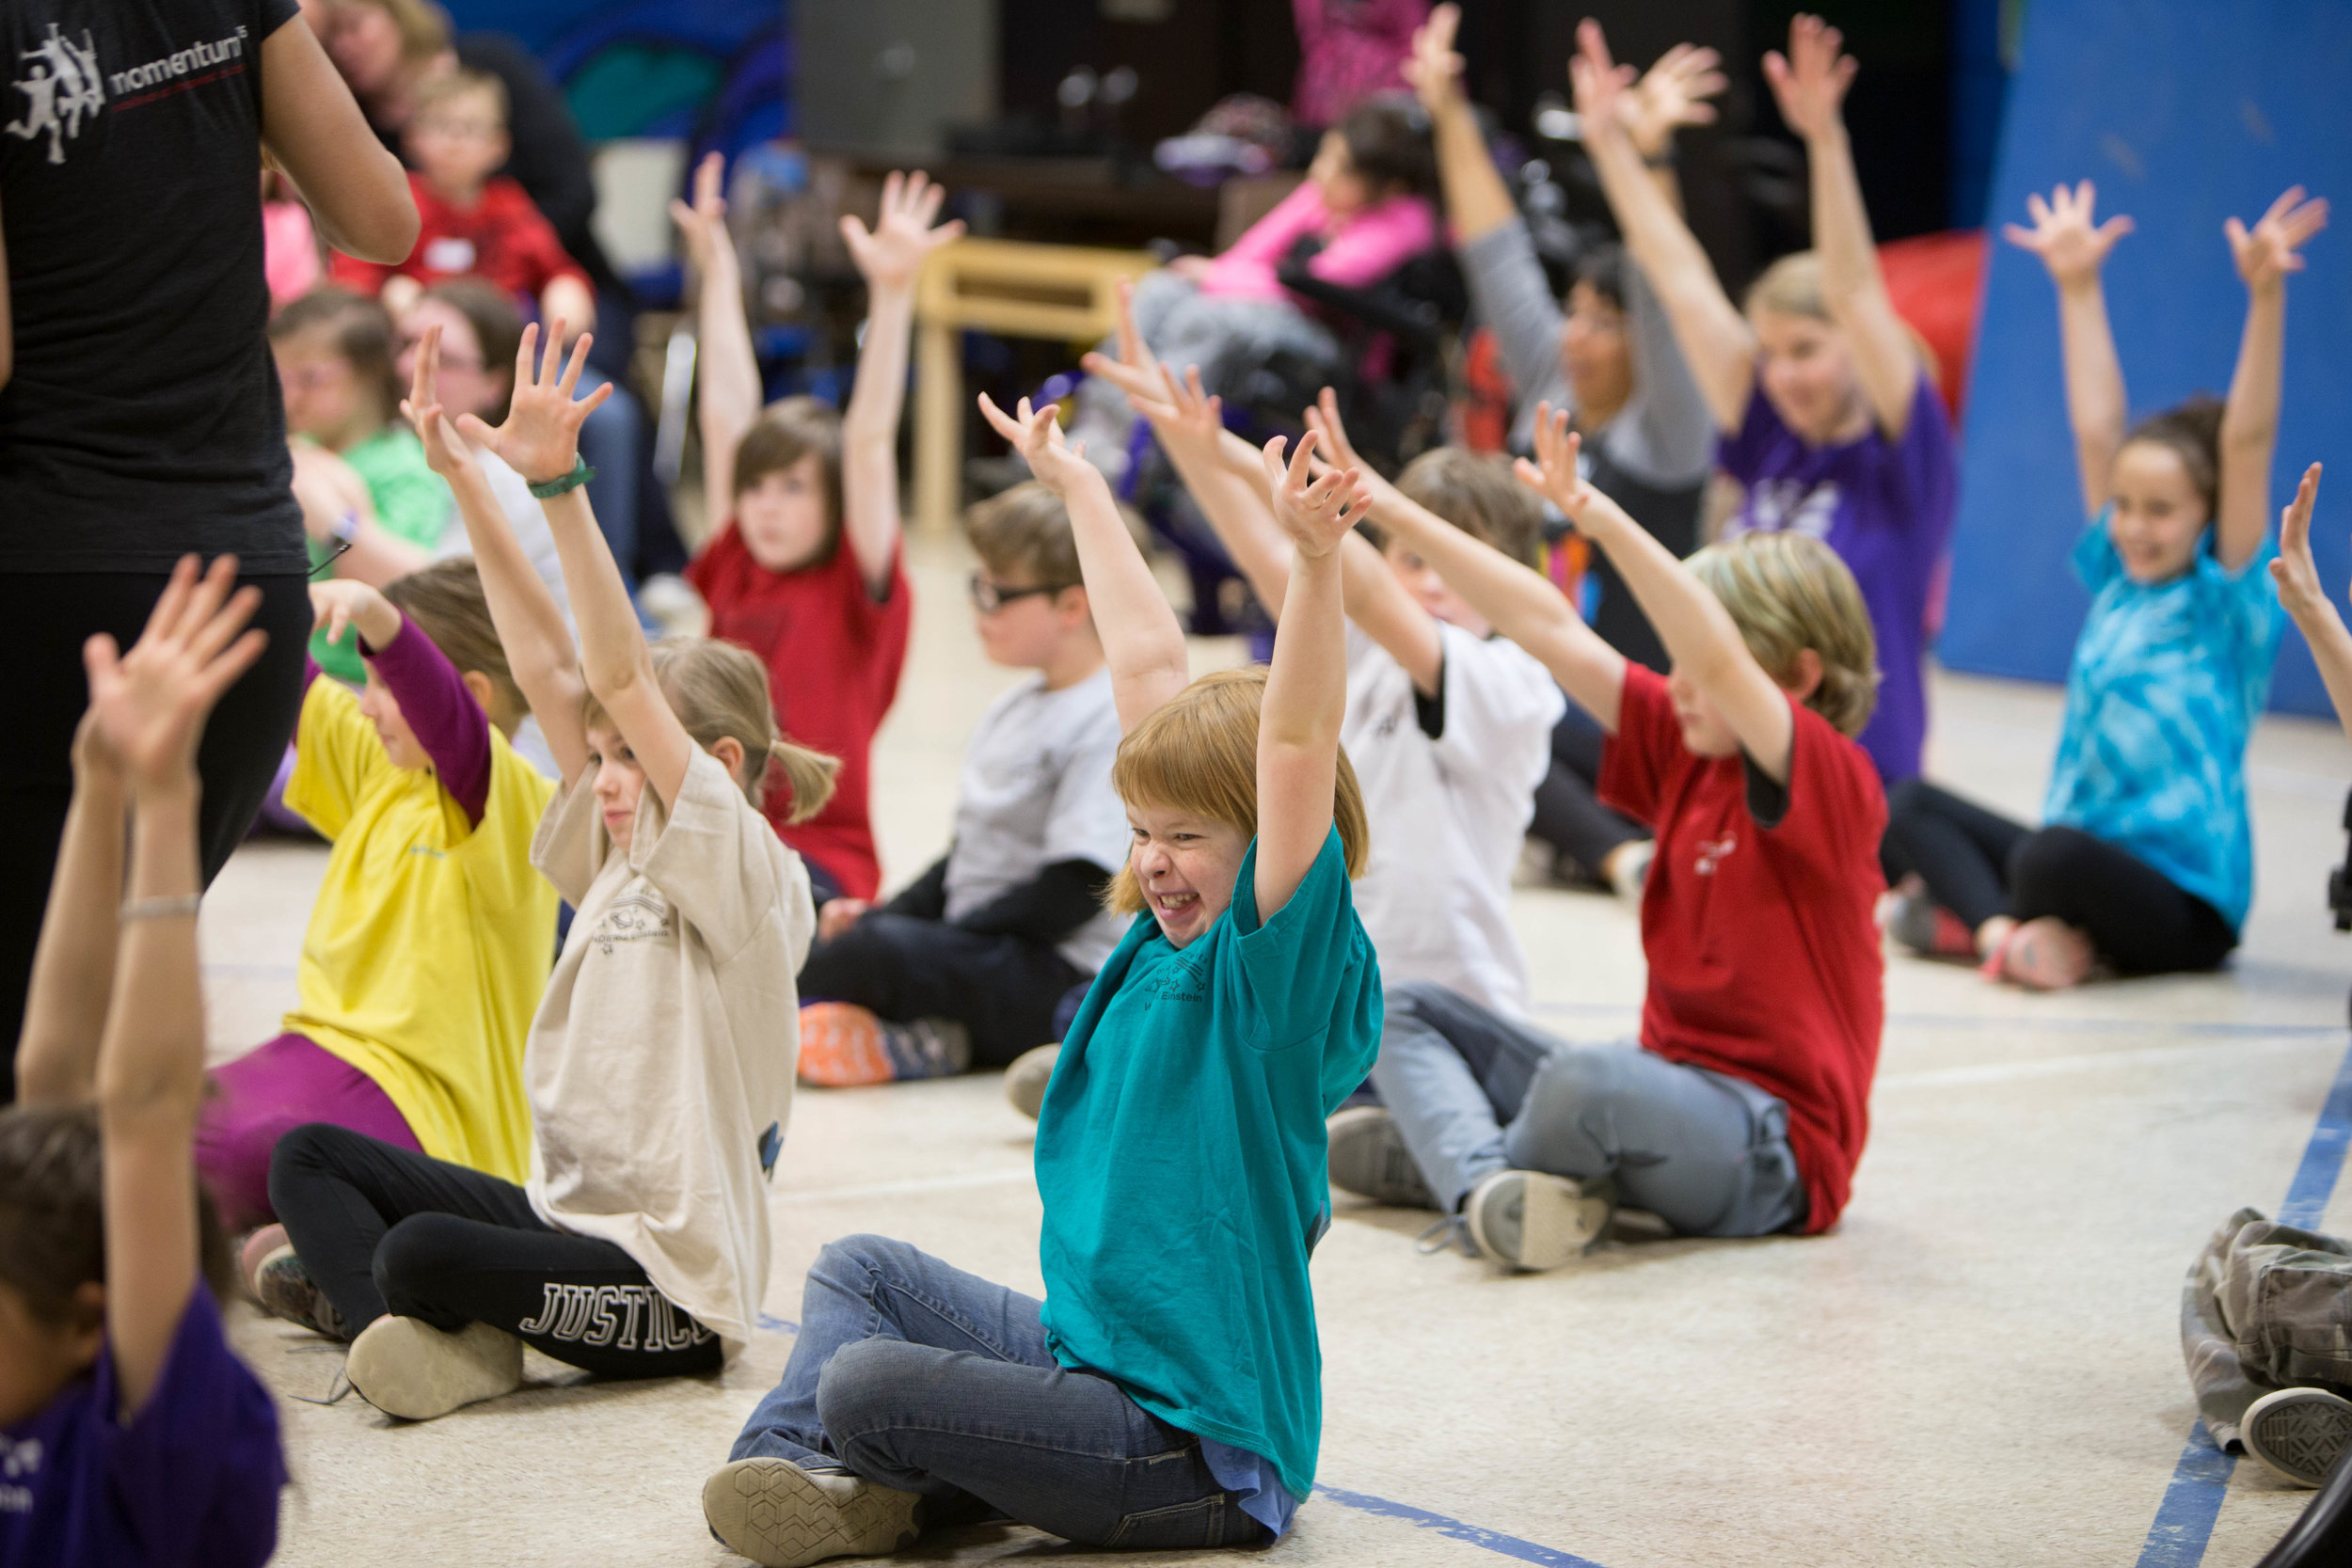 Colerain school performance